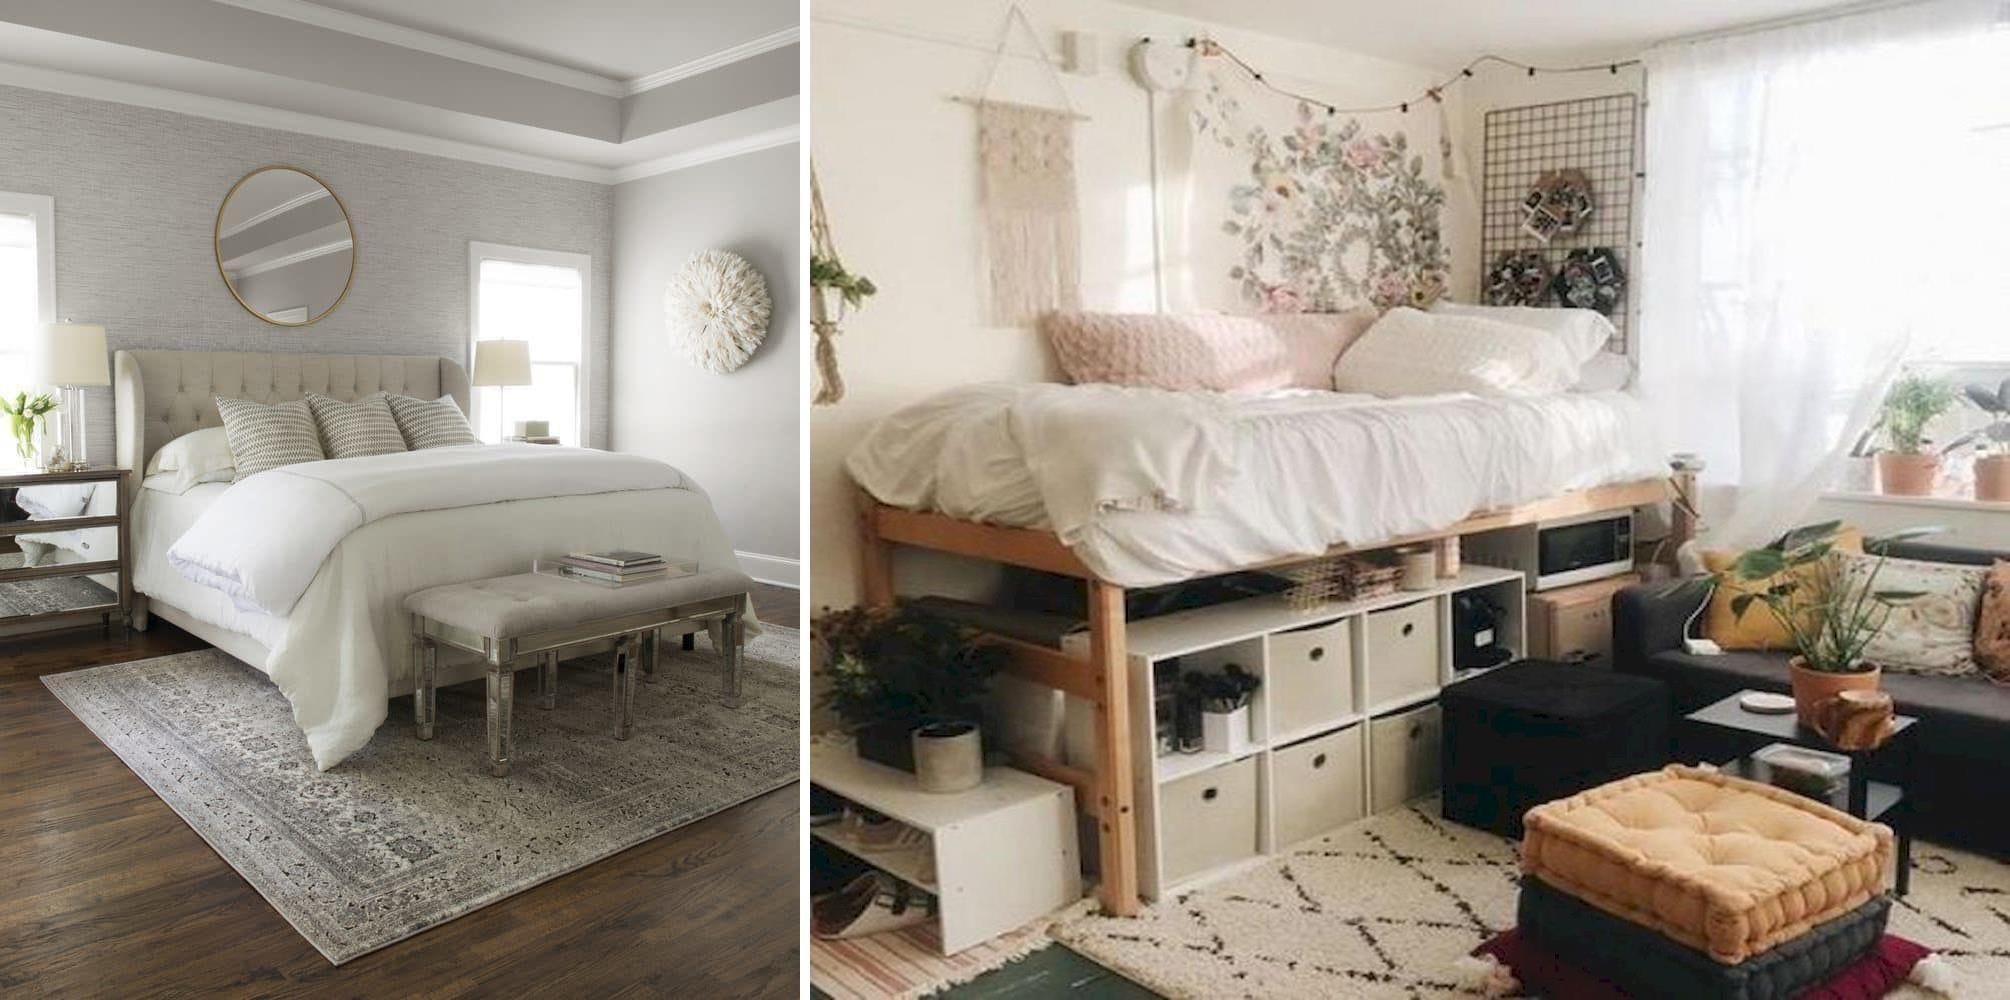 New Bedroom Design Pretty Bedrooms For Adults Ta Home Decor Dorm Room Inspiration Dorm Room Designs College Bedroom Decor